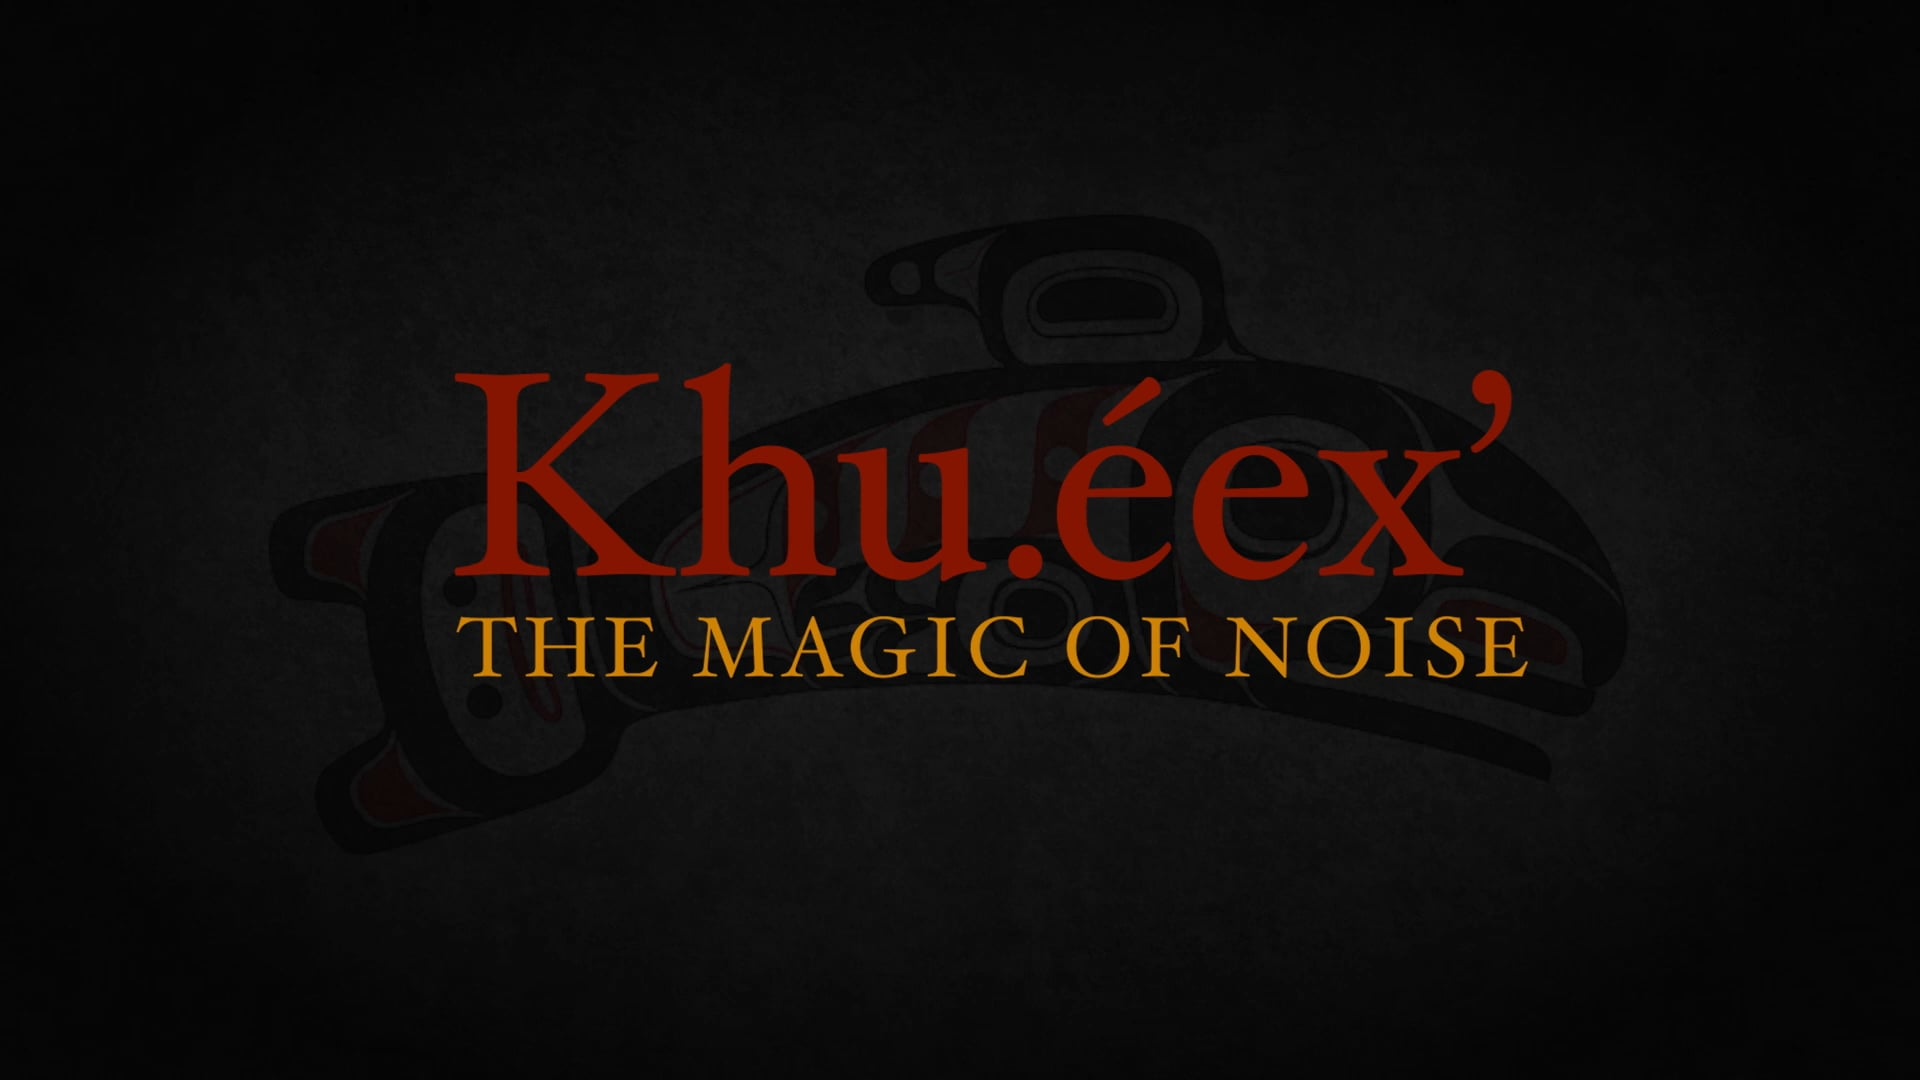 Khu.éex': The Magic of Noise